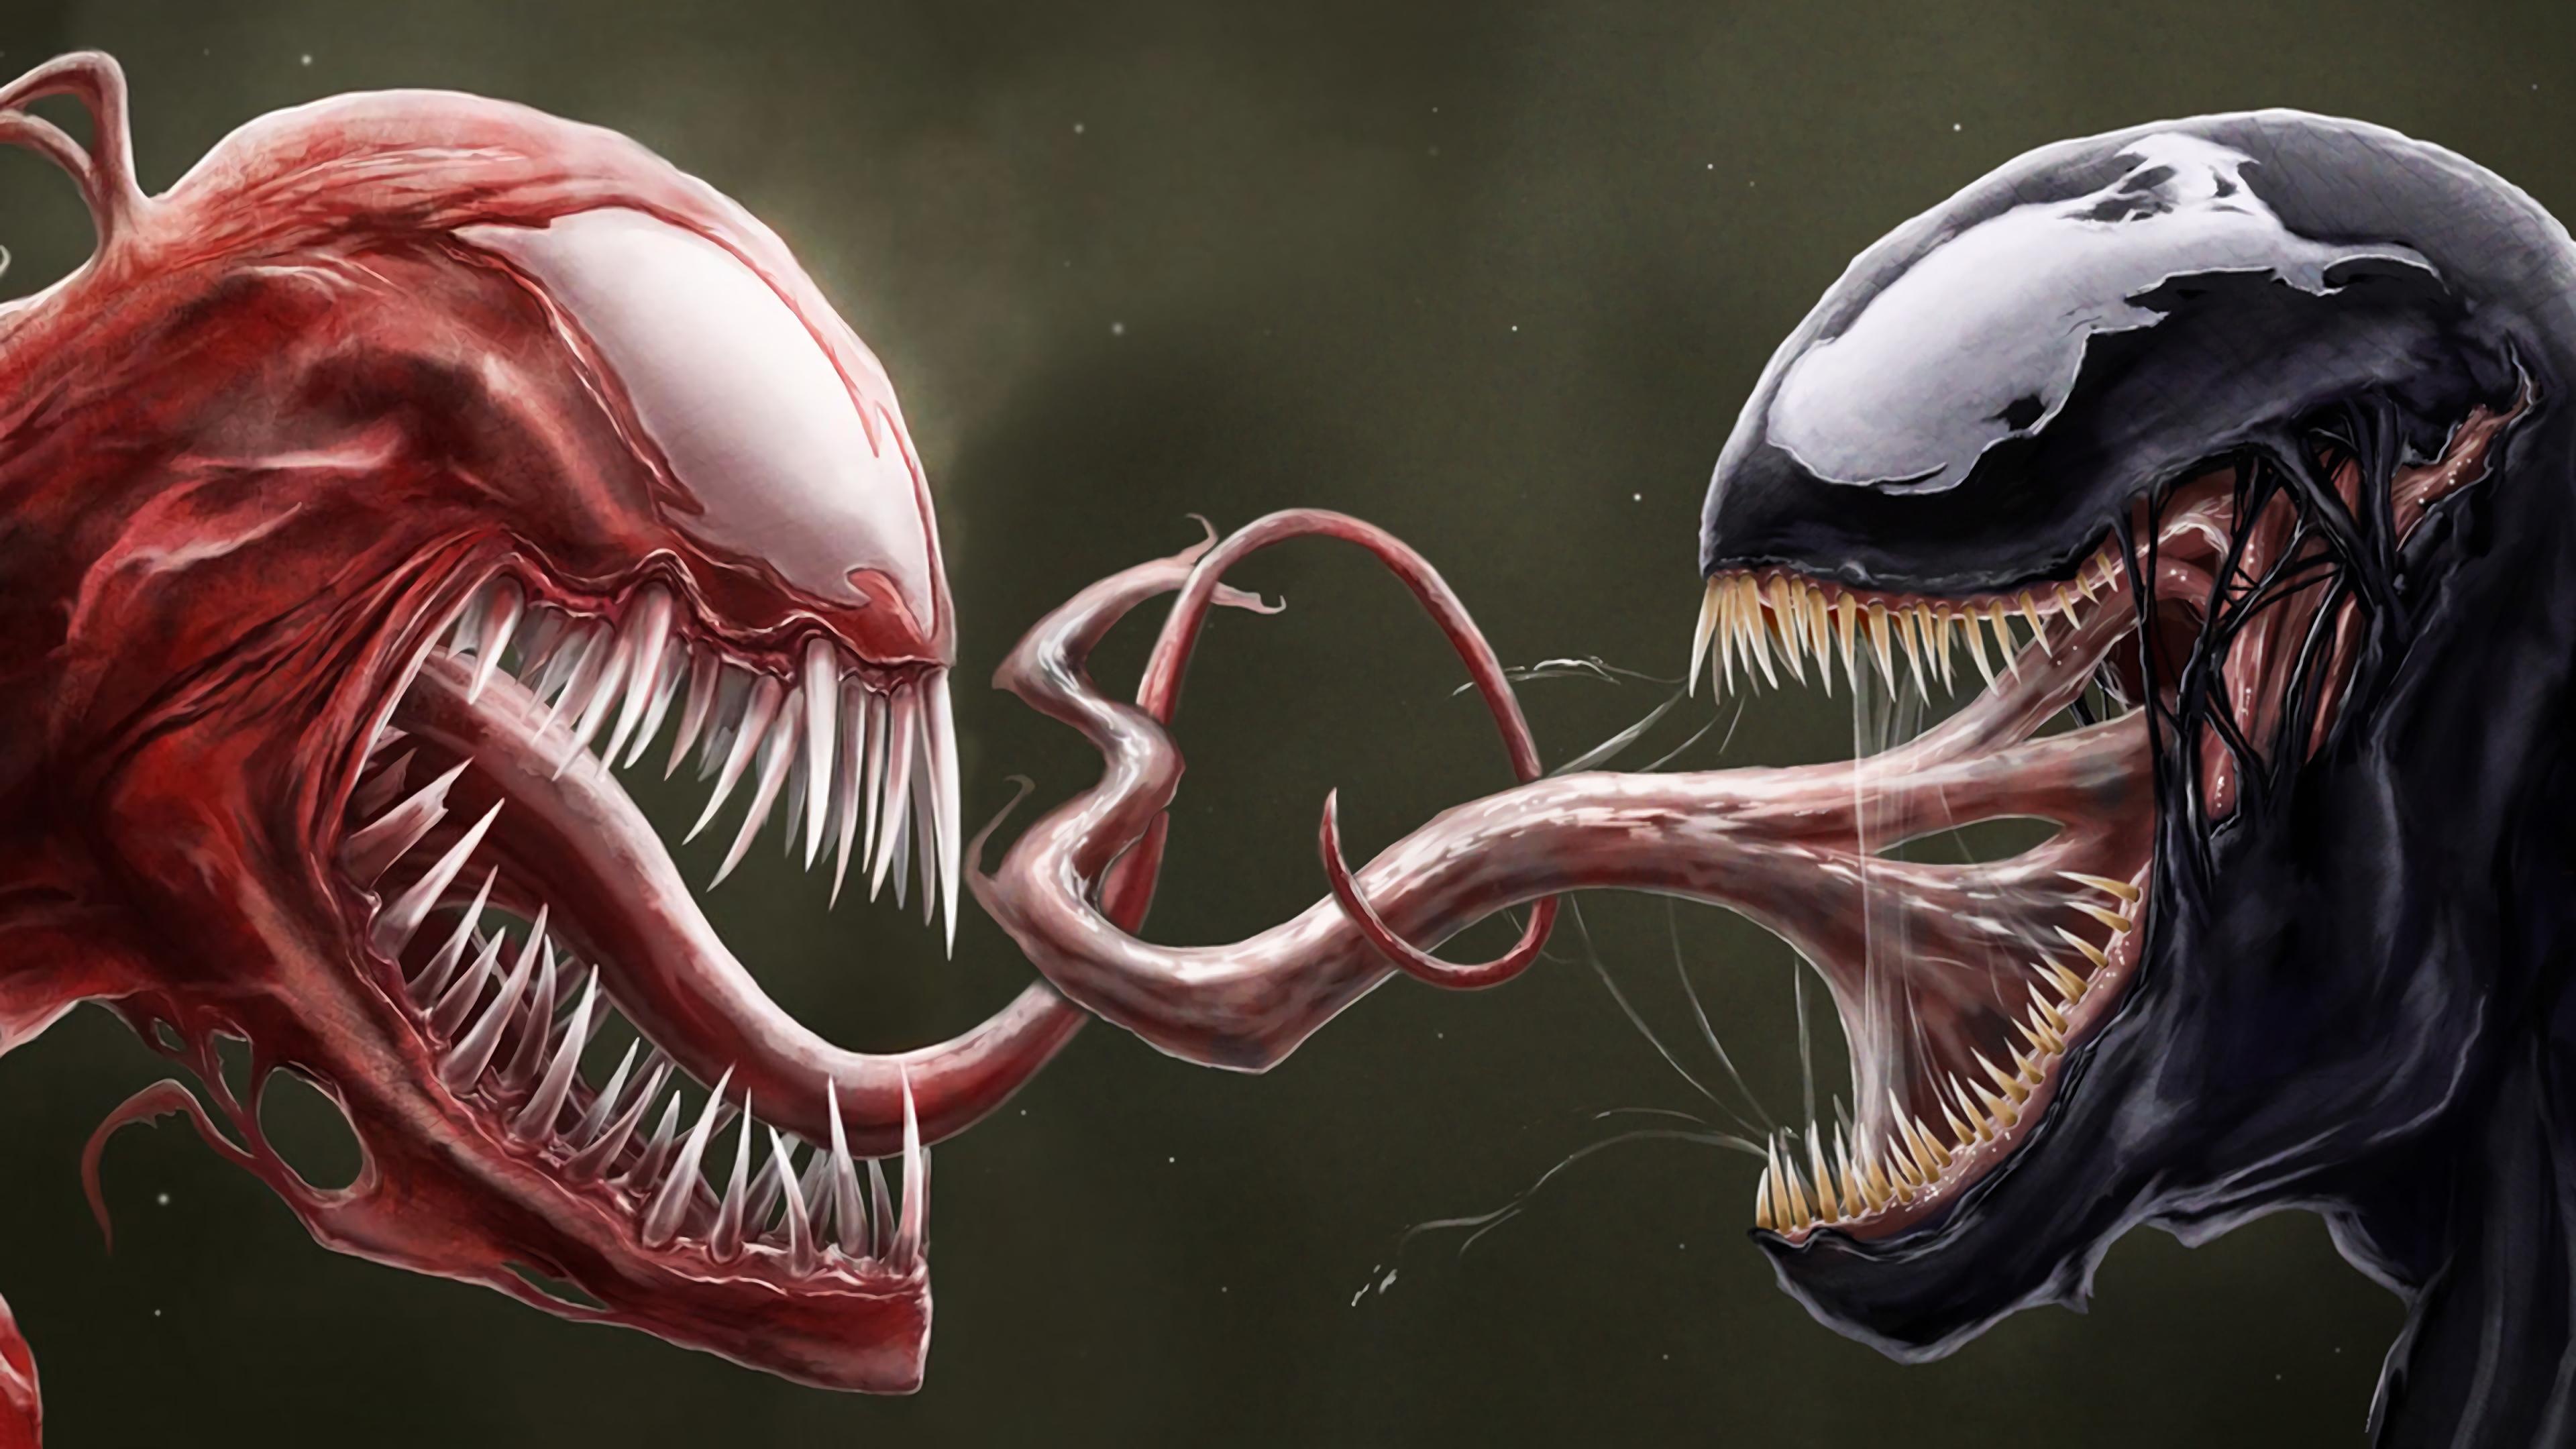 carnage and venom artwork 1536523899 - Carnage And Venom Artwork - Venom wallpapers, supervillain wallpapers, superheroes wallpapers, hd-wallpapers, carnage wallpapers, artwork wallpapers, 4k-wallpapers